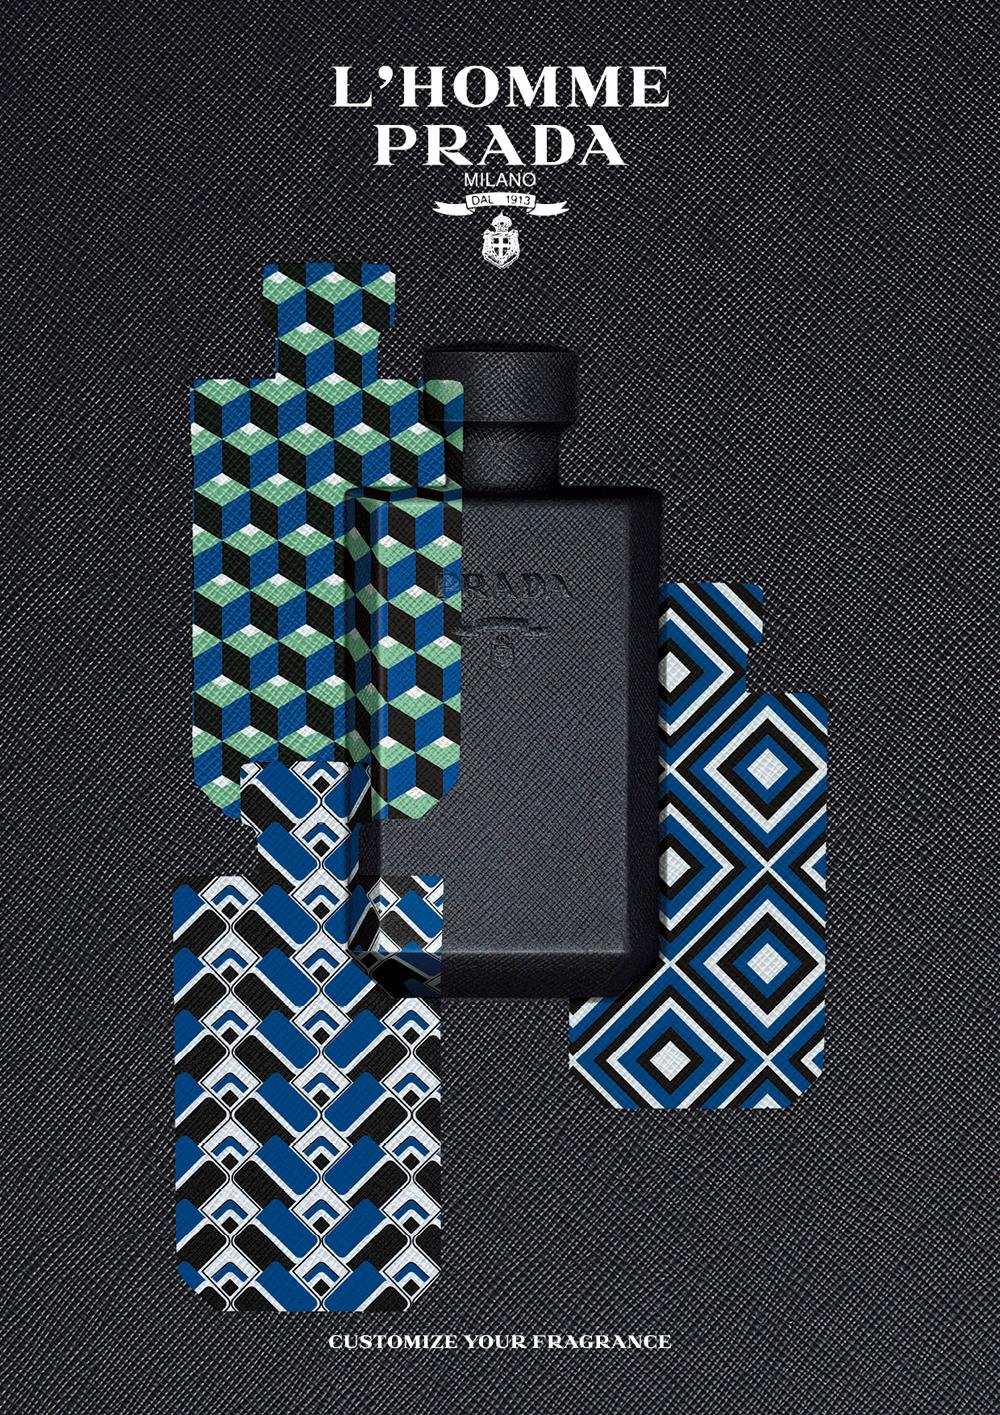 eabfdbf782c6 Atelier Prada: Customize the Look of Fragrances L'Homme Prada and La ...